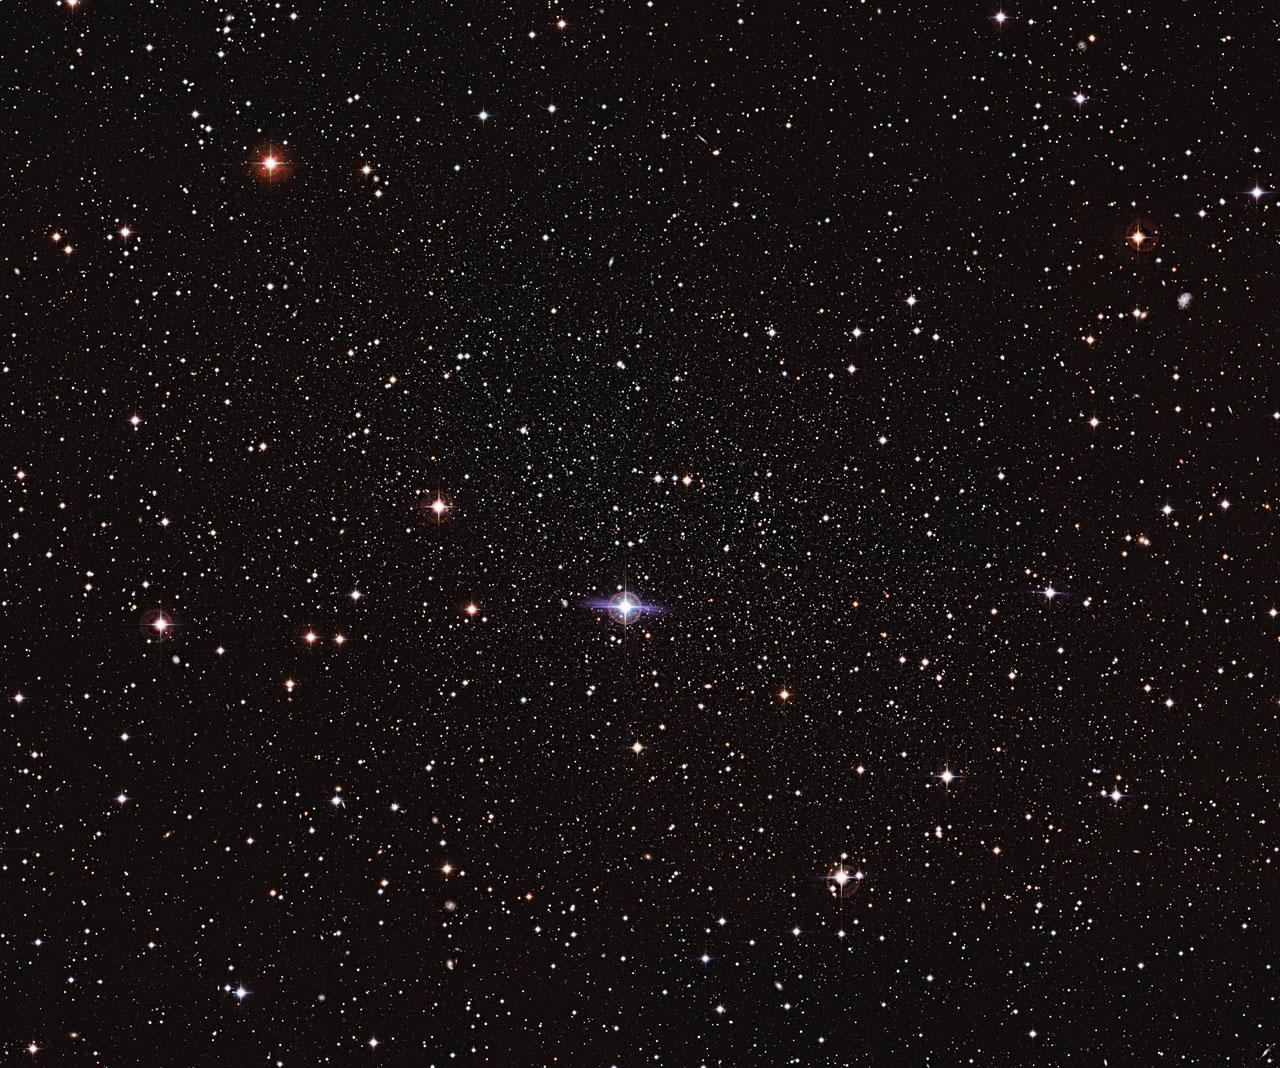 galaxy stars tumblr-#29